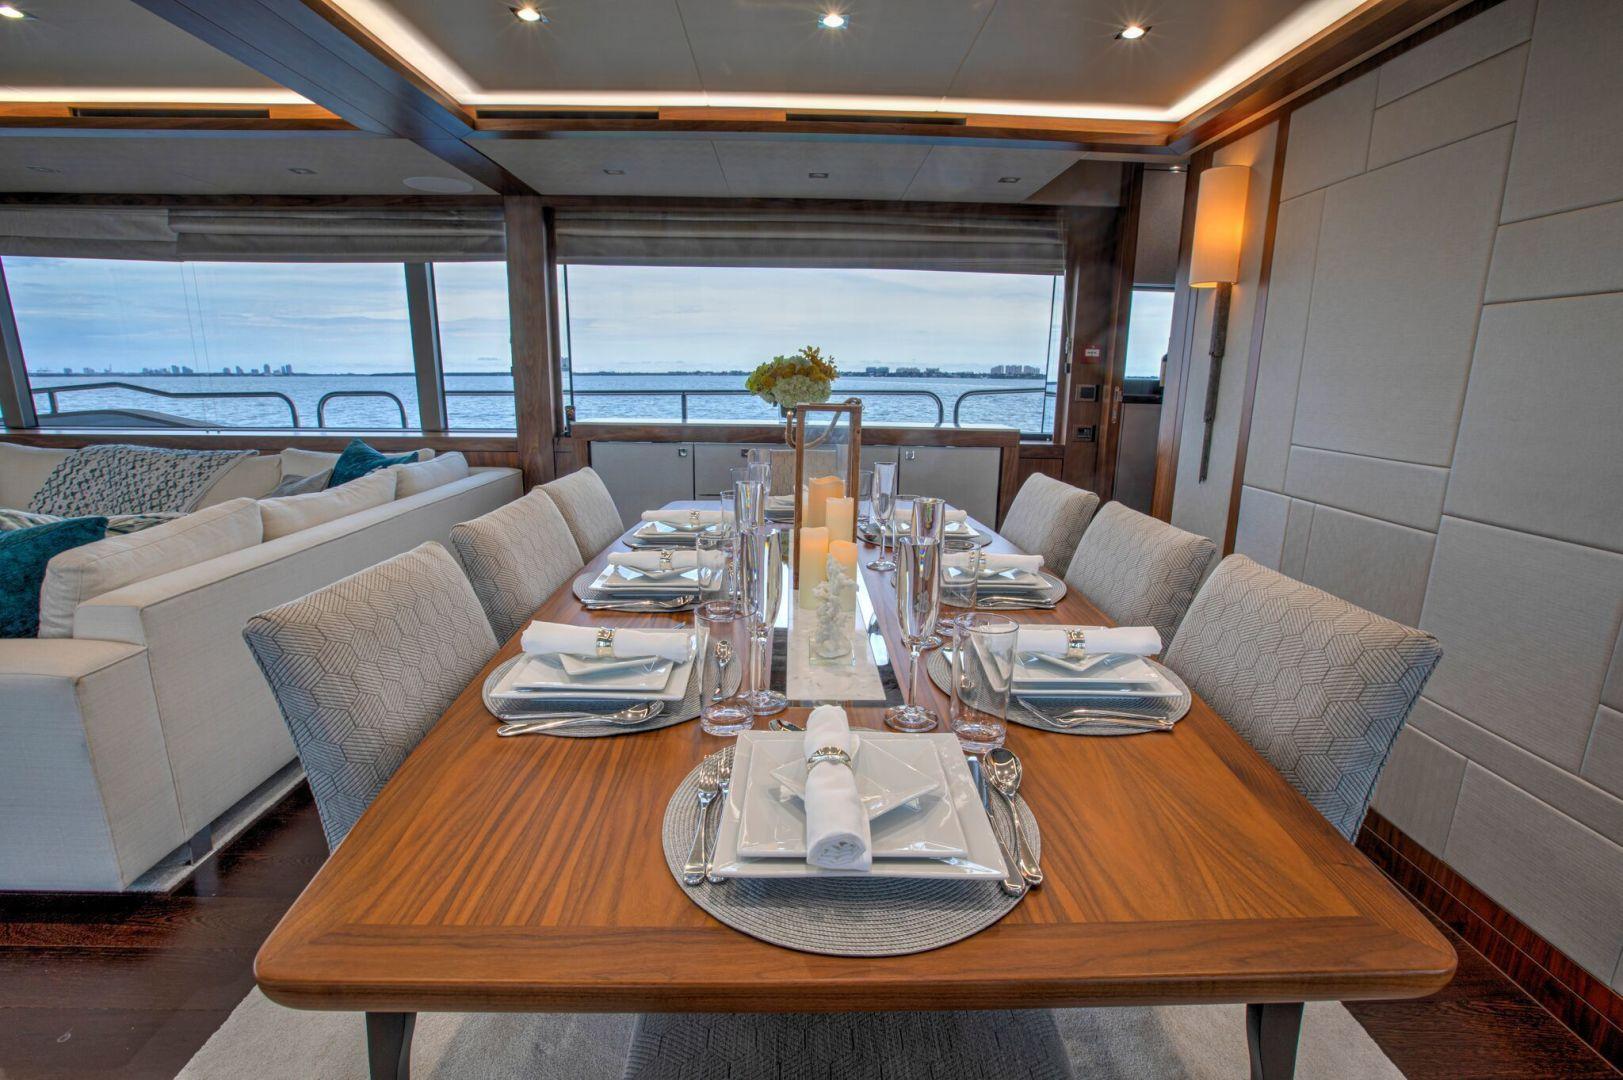 Sunseeker-95 Yacht 2017-Perseverance 3 Ft Lauderdale-Florida-United States-1400081   Thumbnail